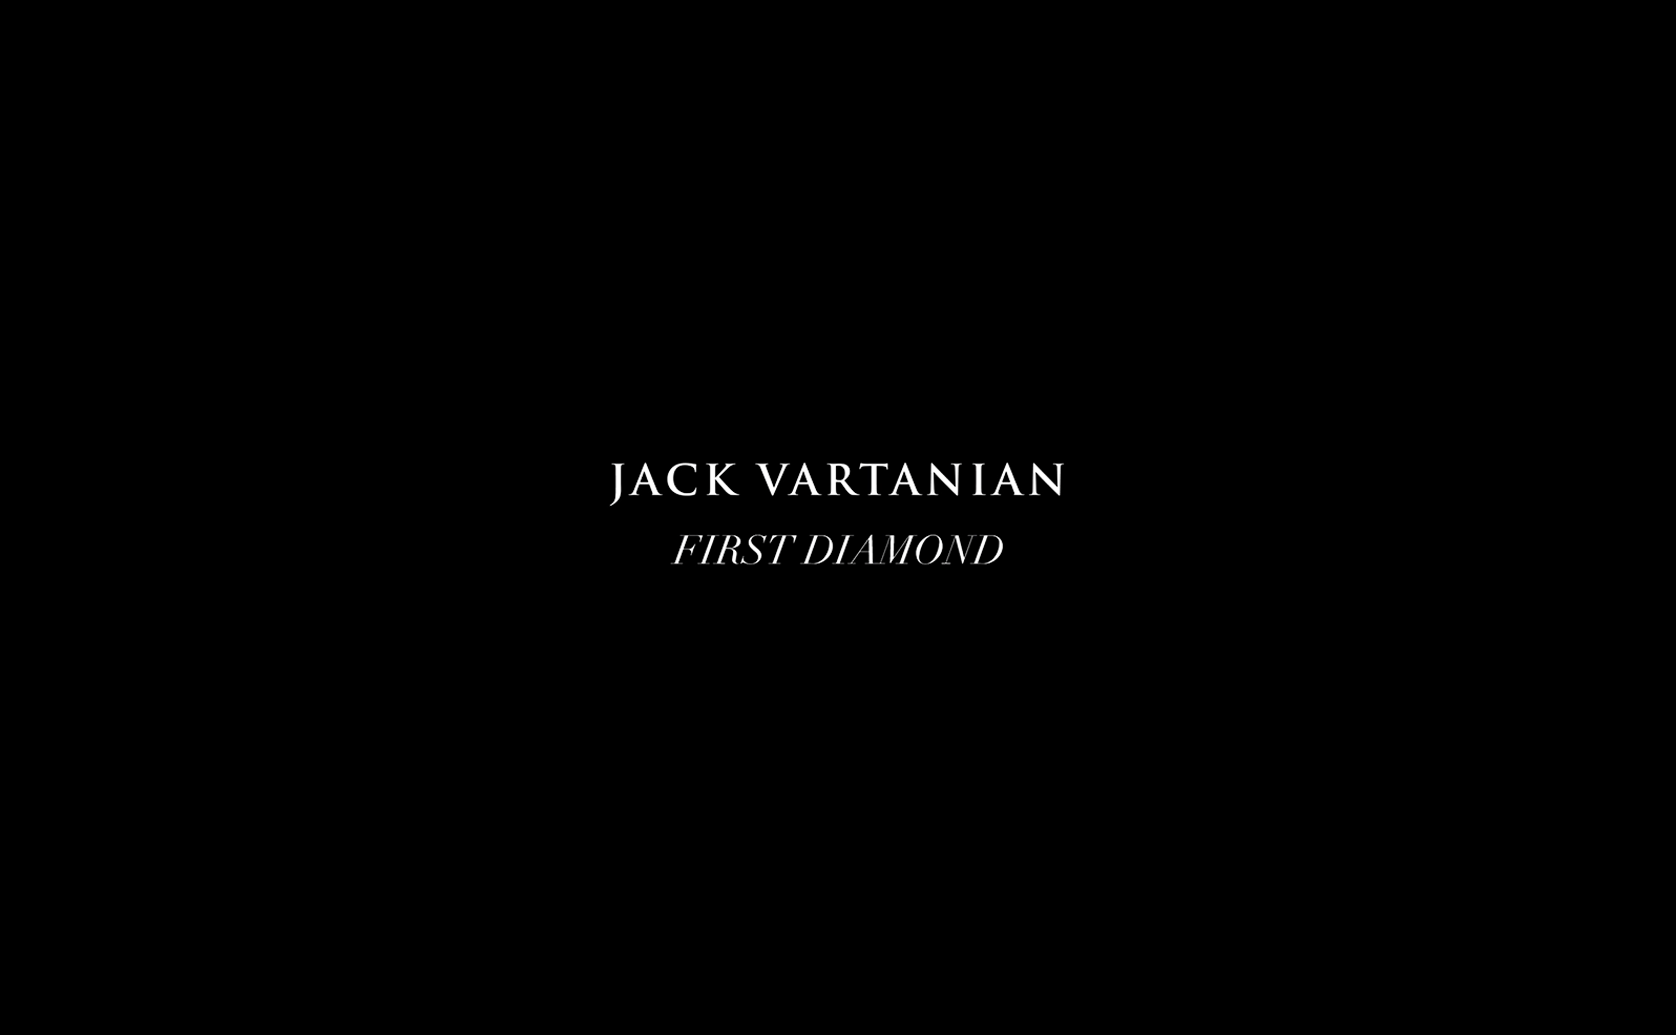 JACK VARTANIAN | FIRST DIAMOND